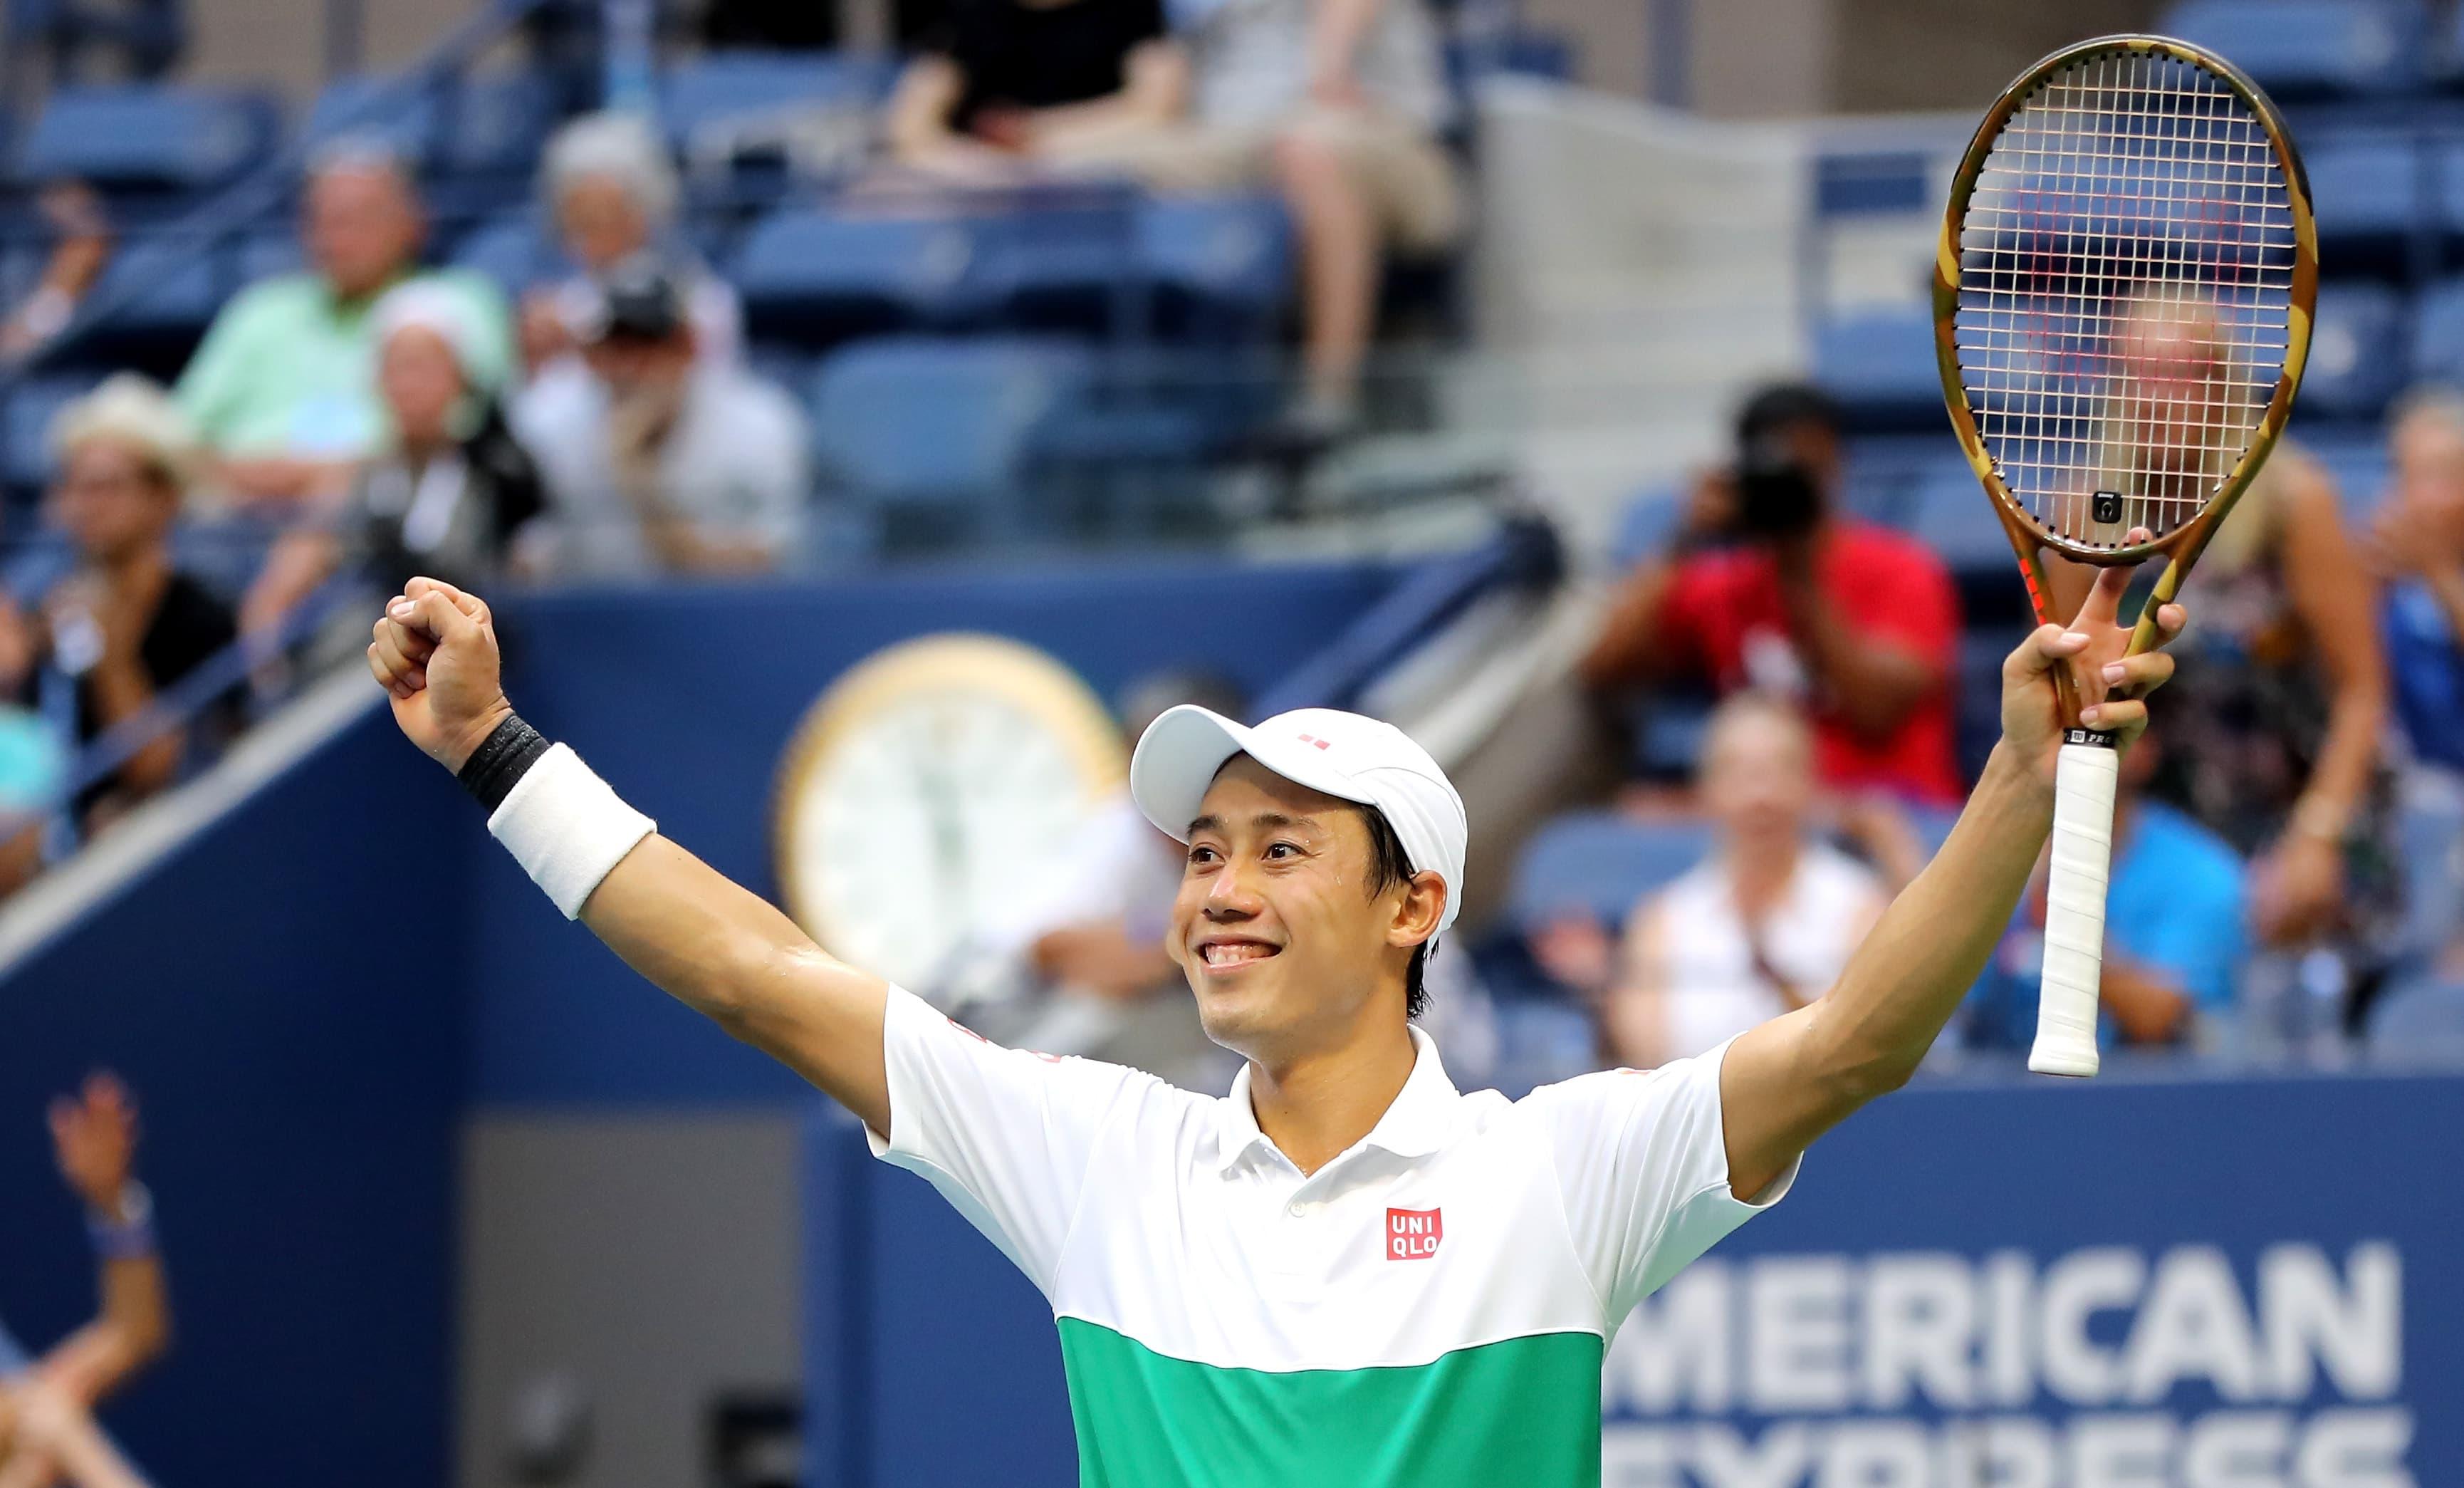 Nishikori joins Federer, Djokovic as highest-paid tennis players: Forbes